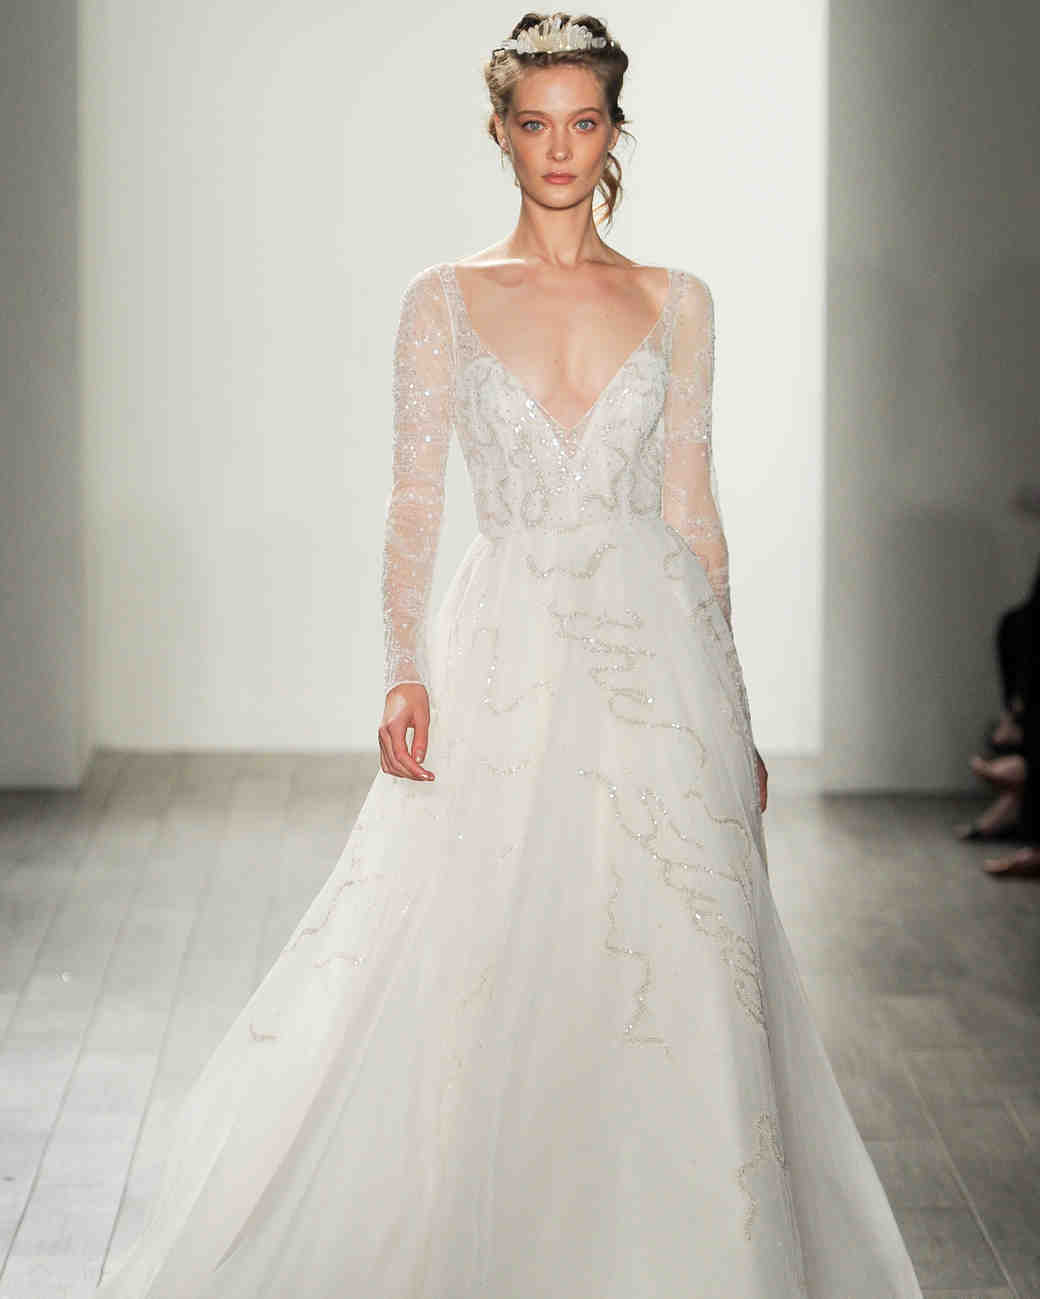 Hayley Paige Fall 2017 Wedding Dress Collection | Martha Stewart ...